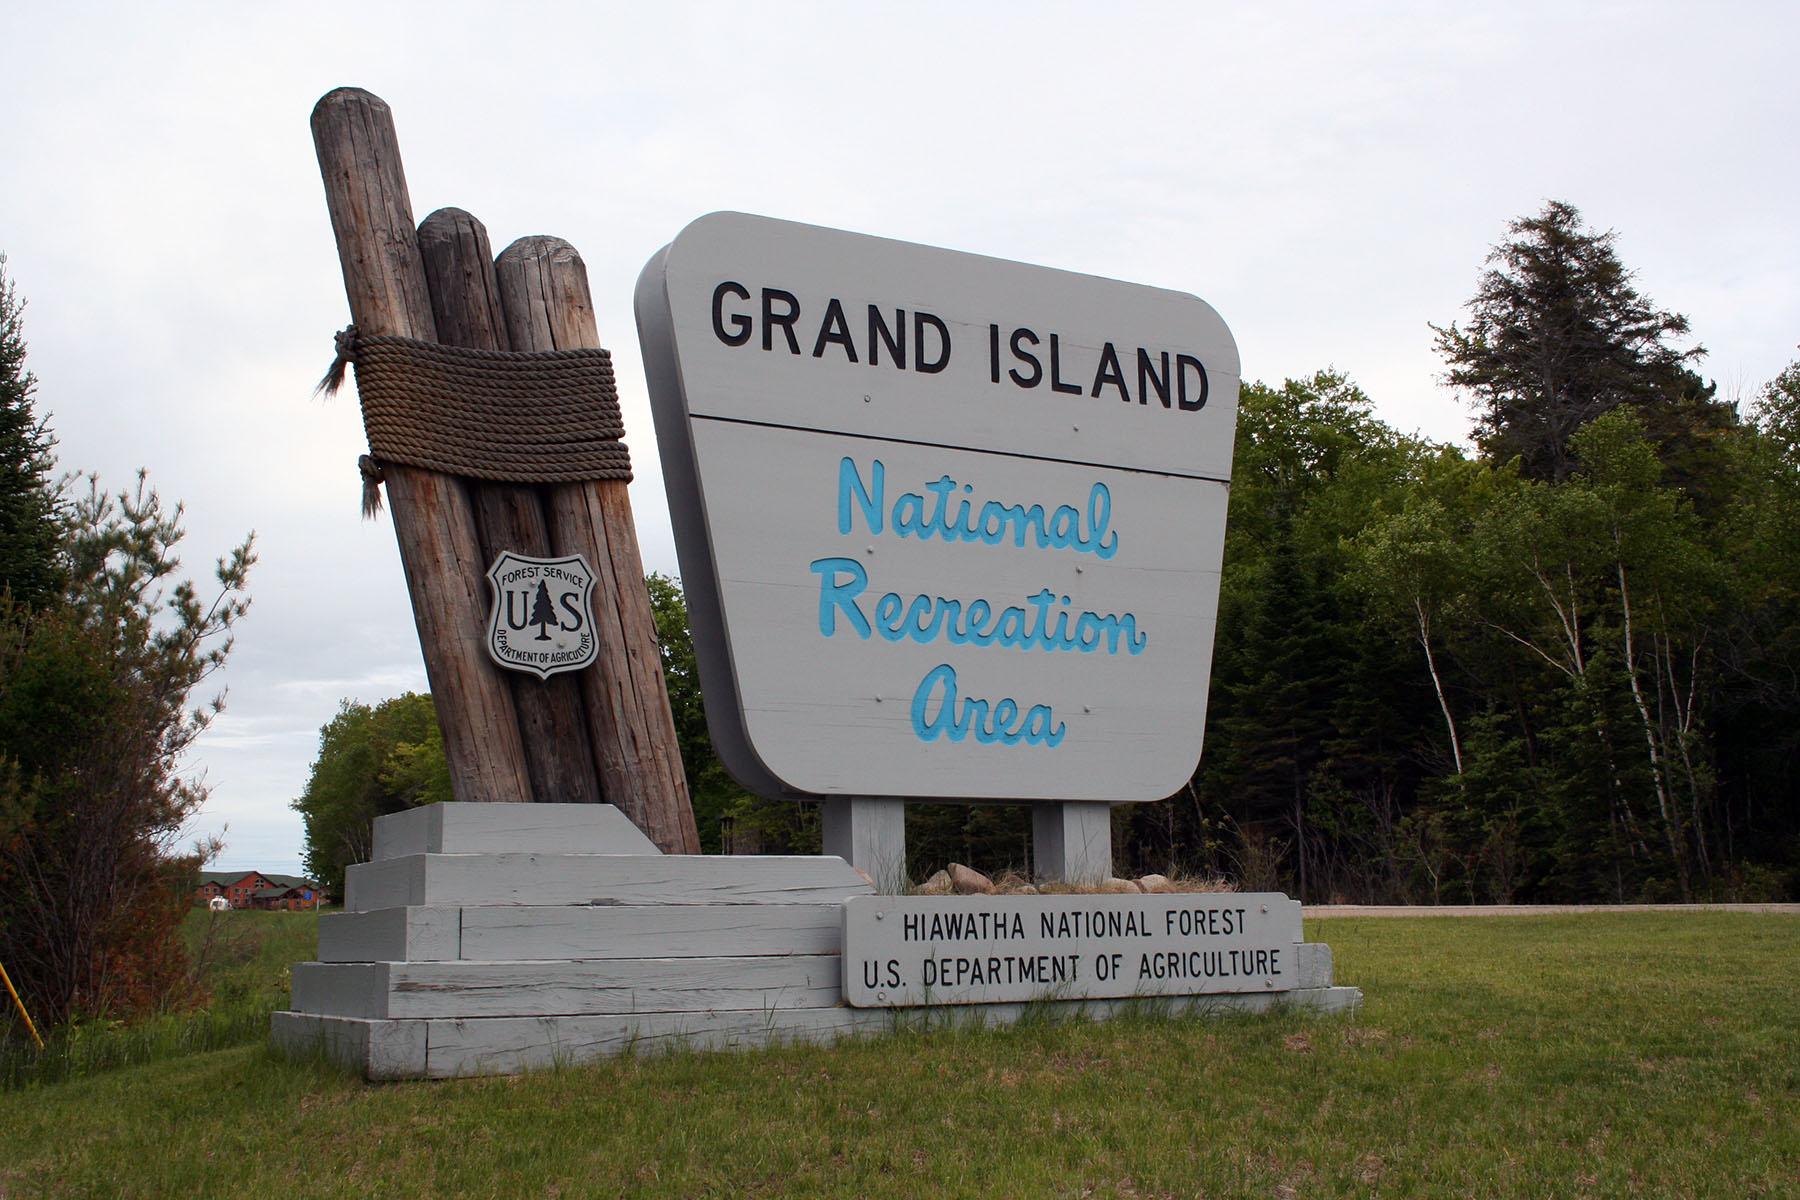 Hiawatha National Forest Grand Island National Recreation Area